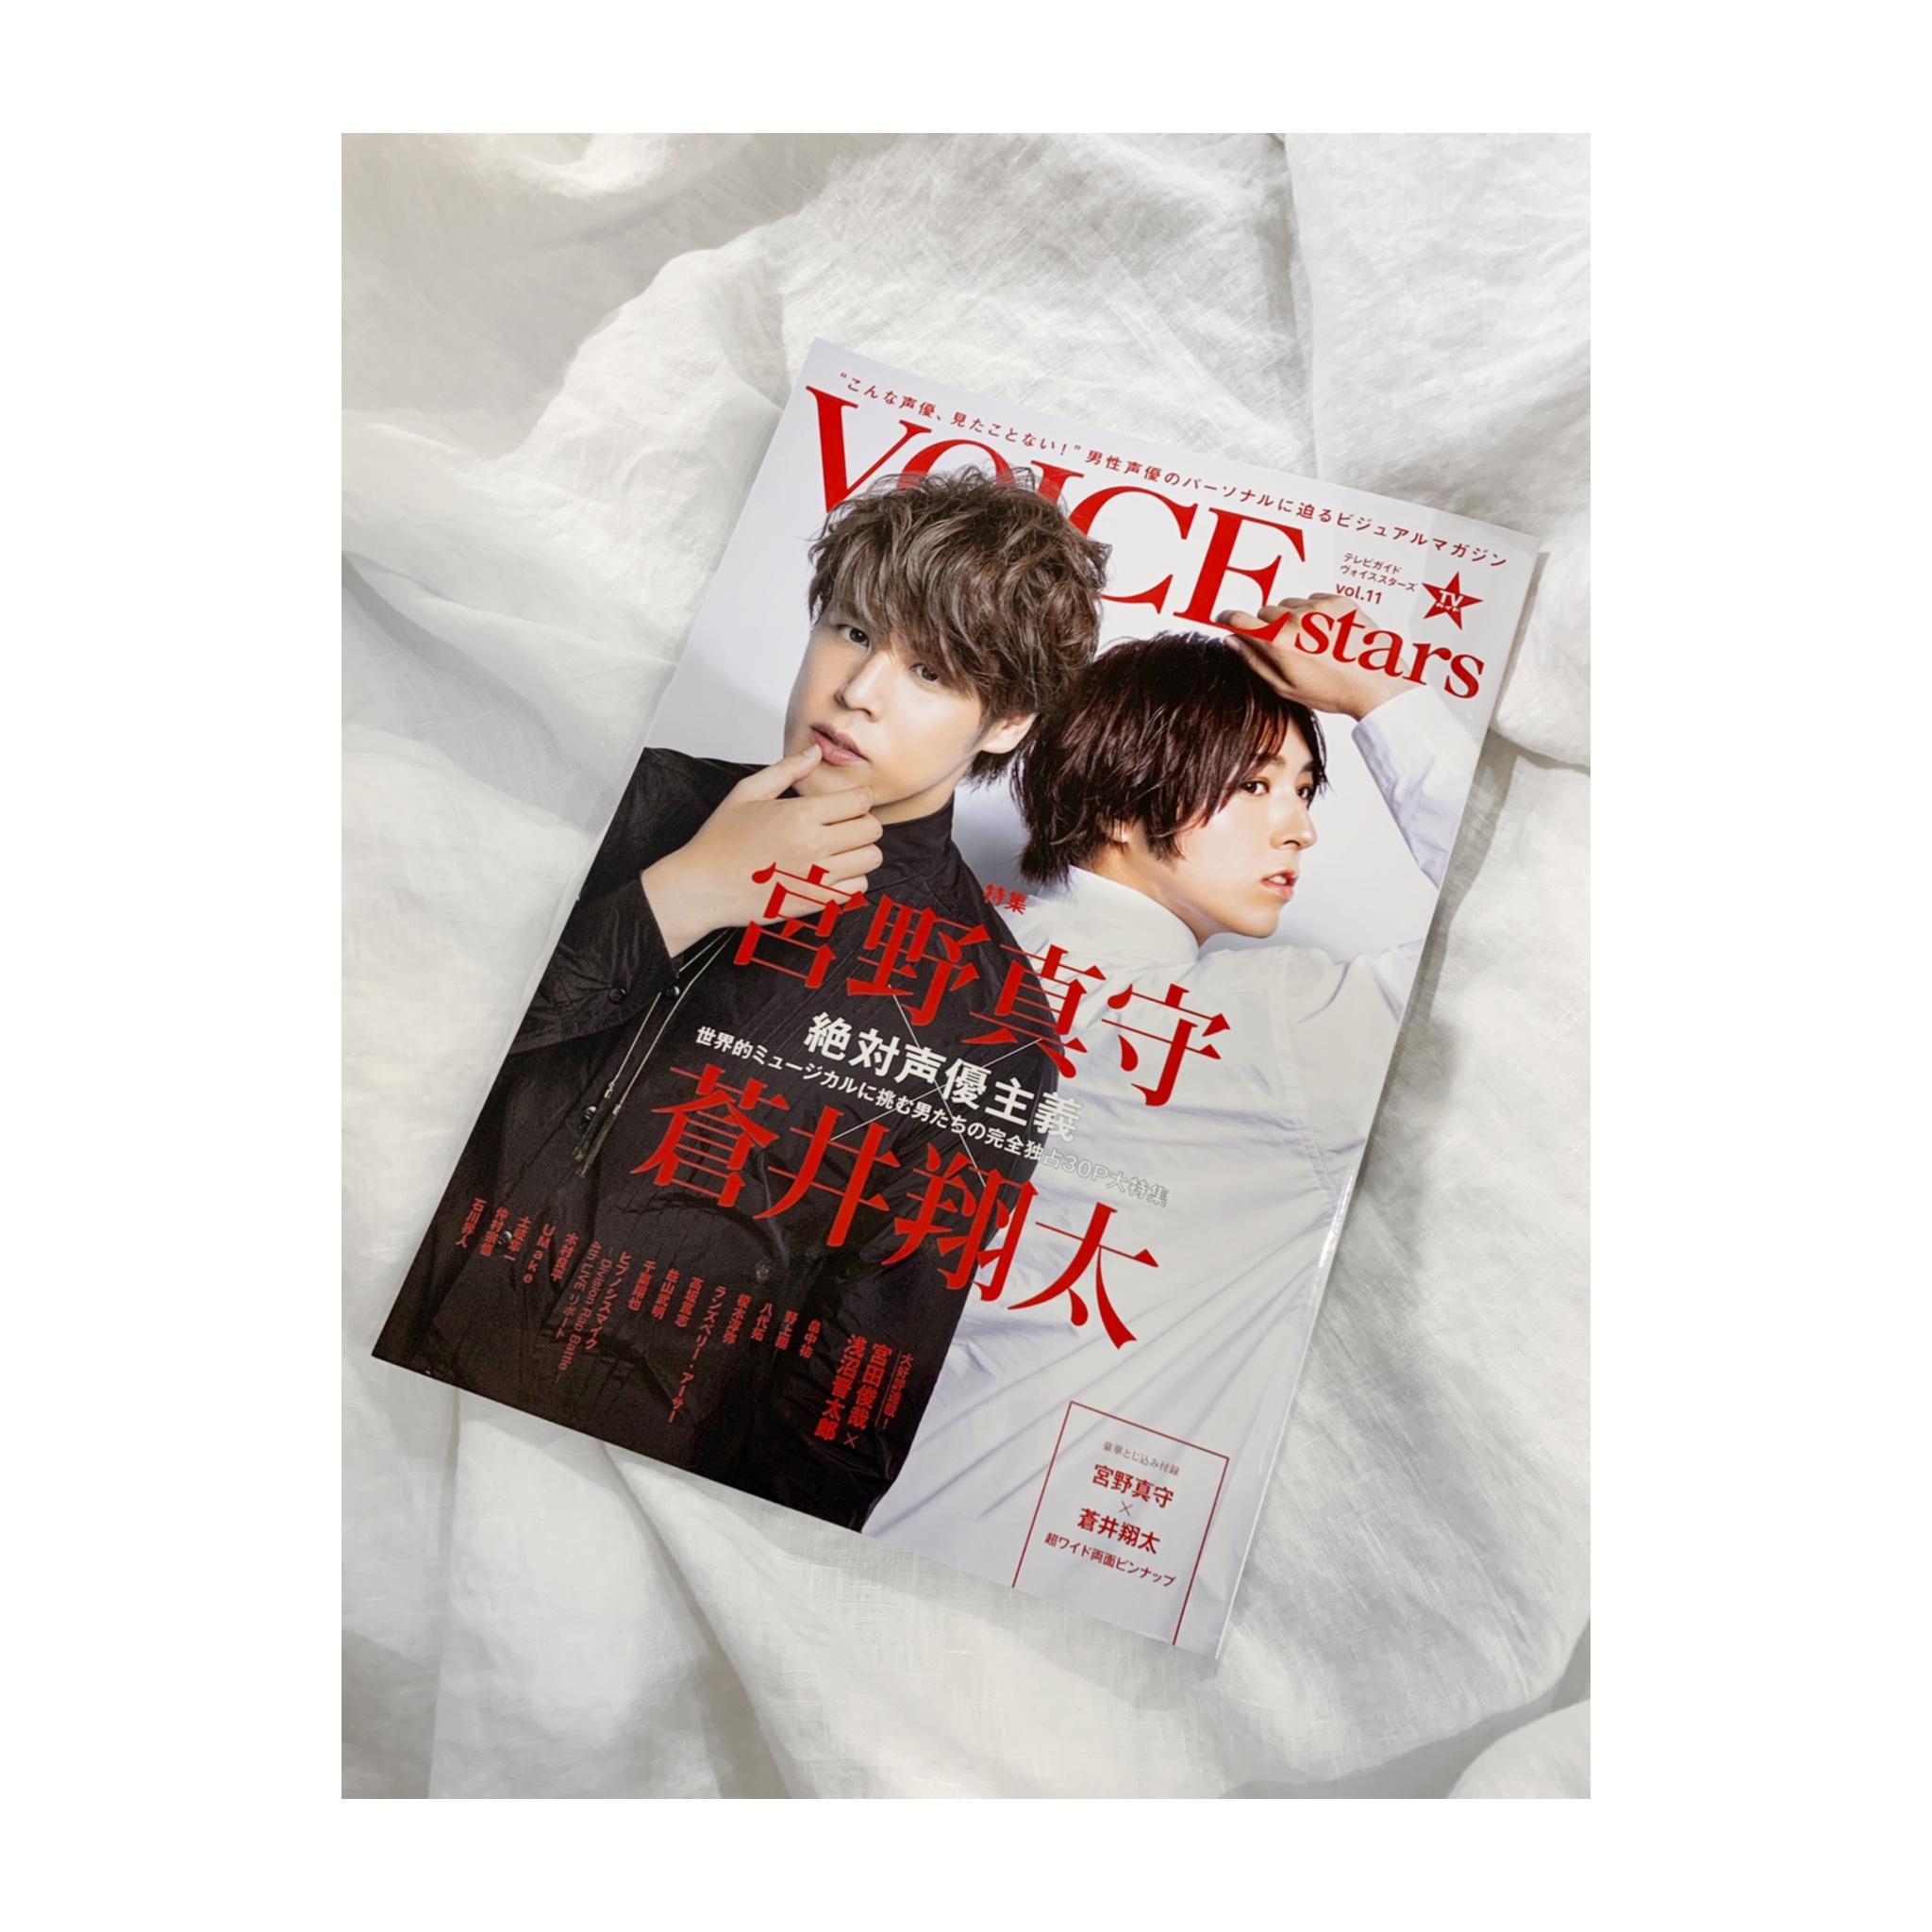 【press release】VOISE stars vol 11 榎木 淳也/高坂篤志さん着用